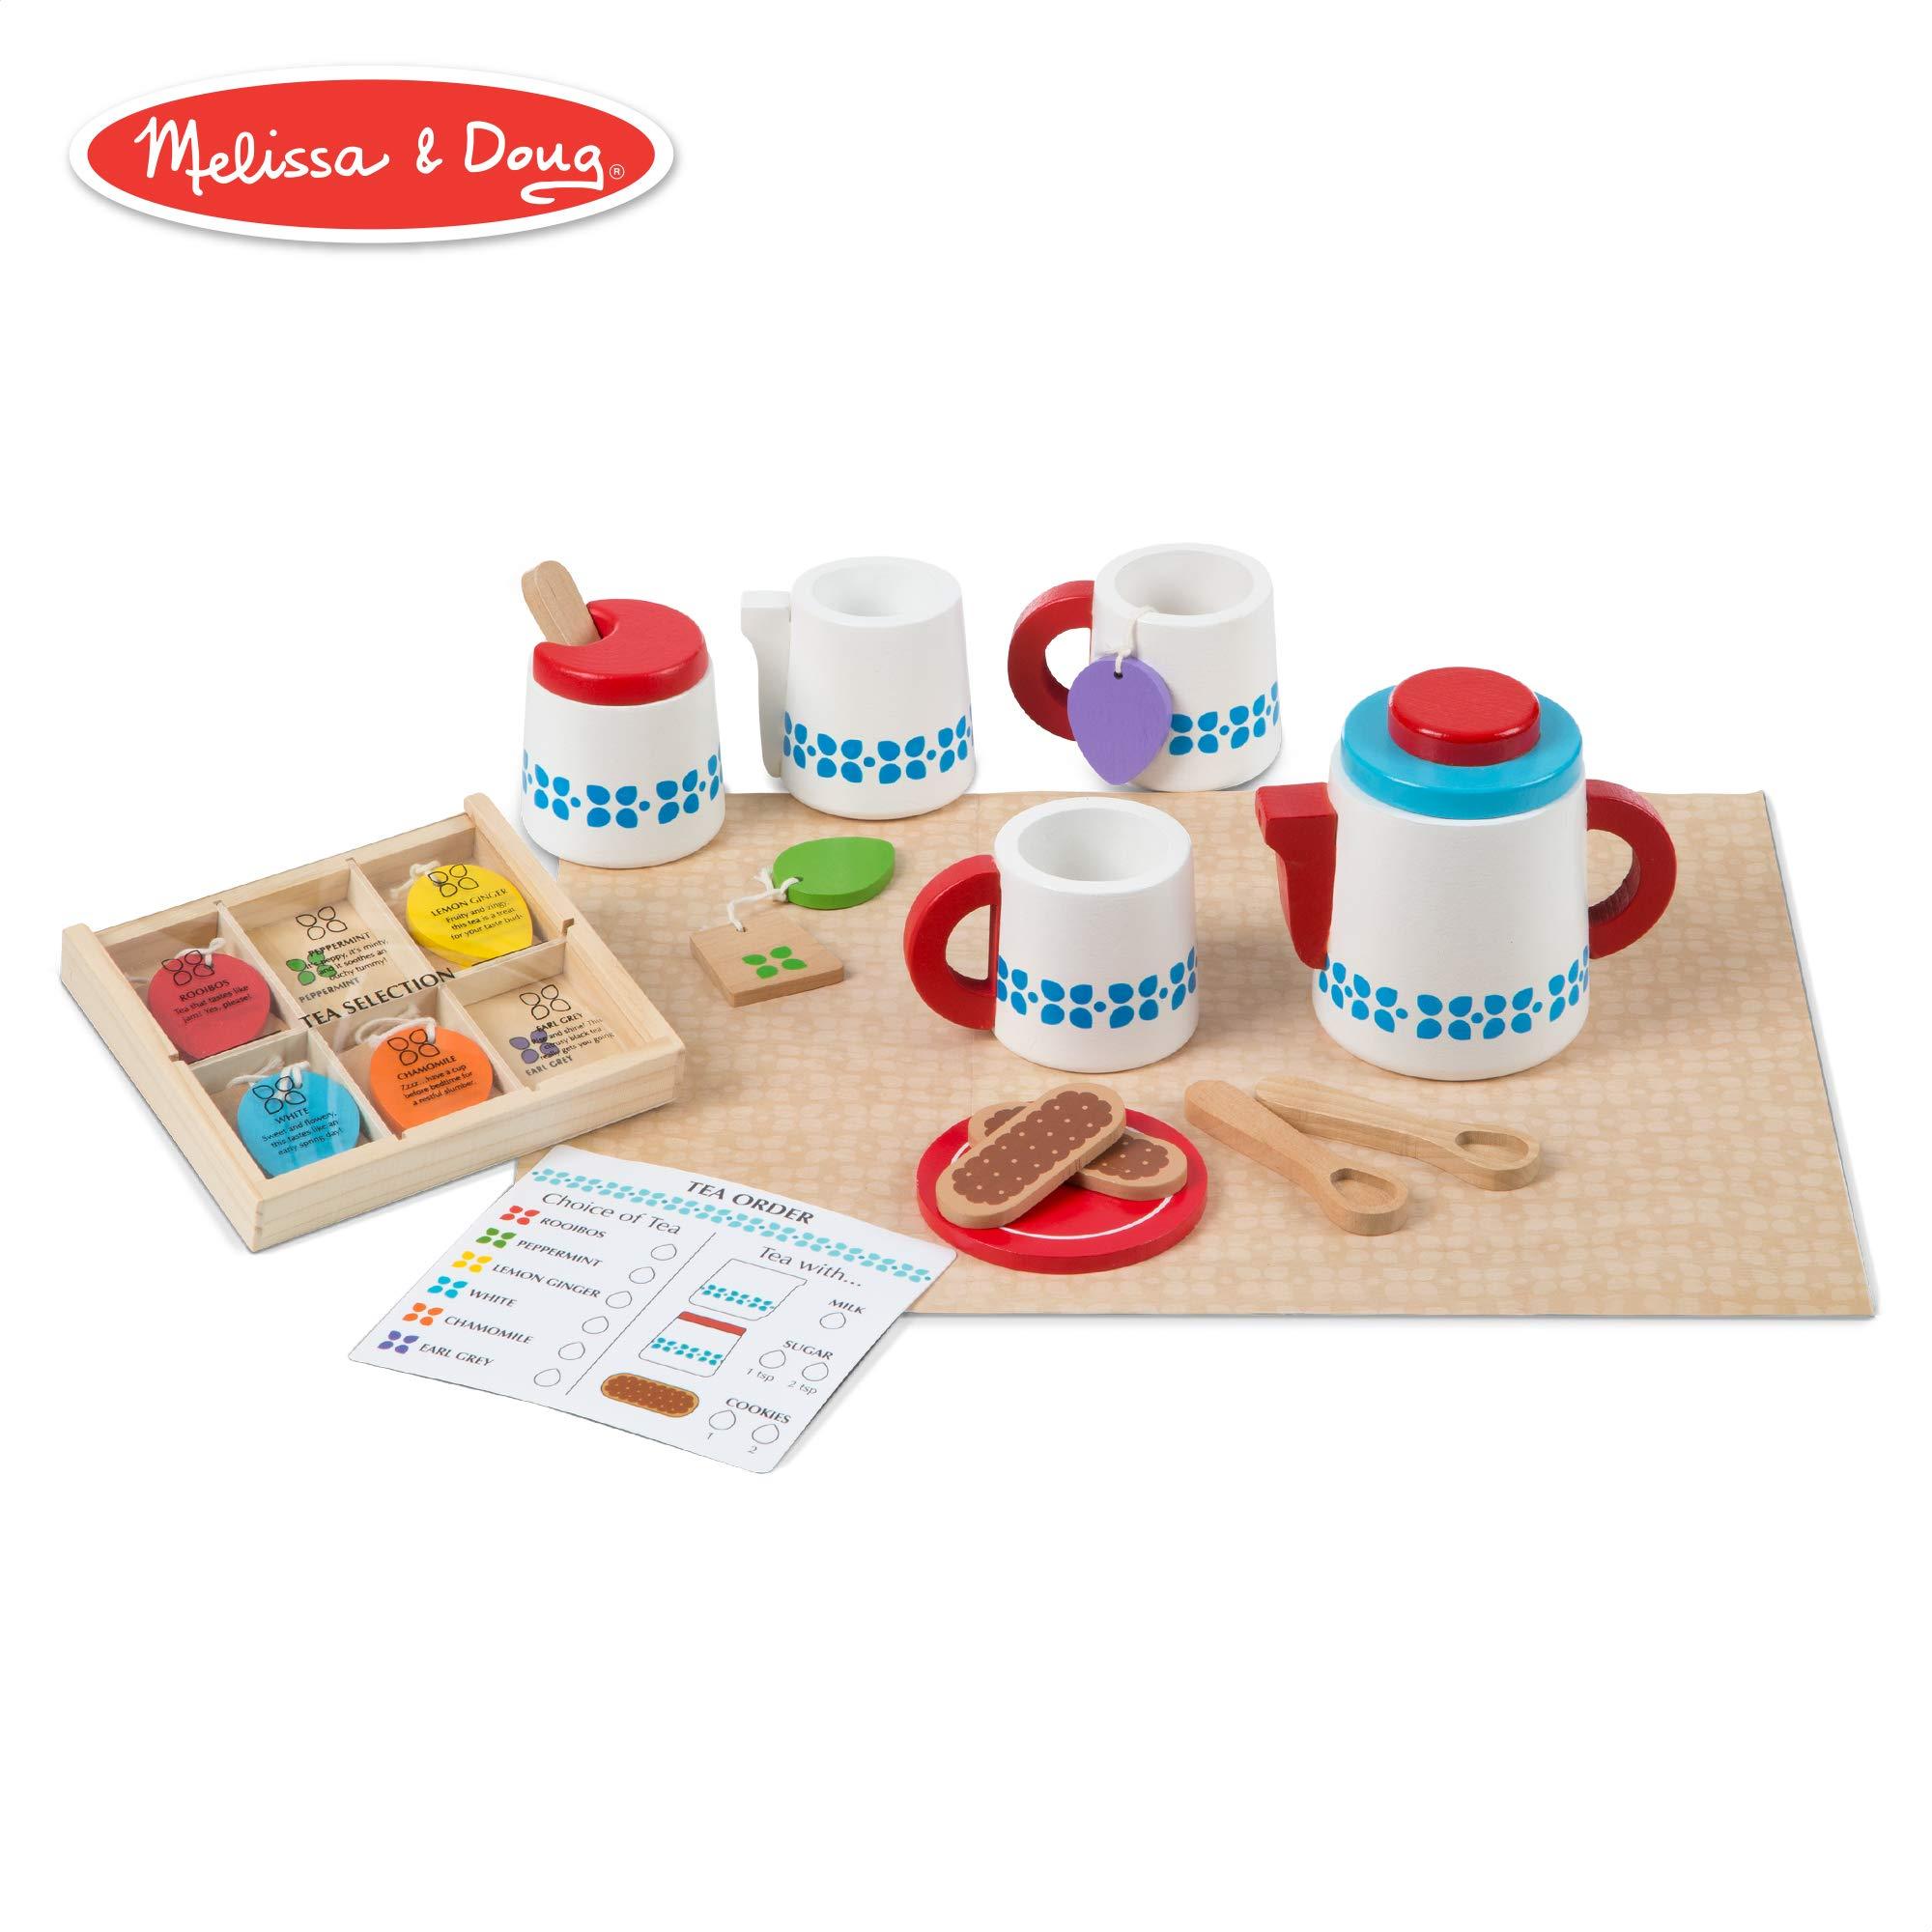 Melissa & Doug Wooden Steep & Serve Tea Set (Pretend Play, All-Wood Tea Service, Brightly Colored Tags, 12'' H x 15'' W x 3.5'' L)